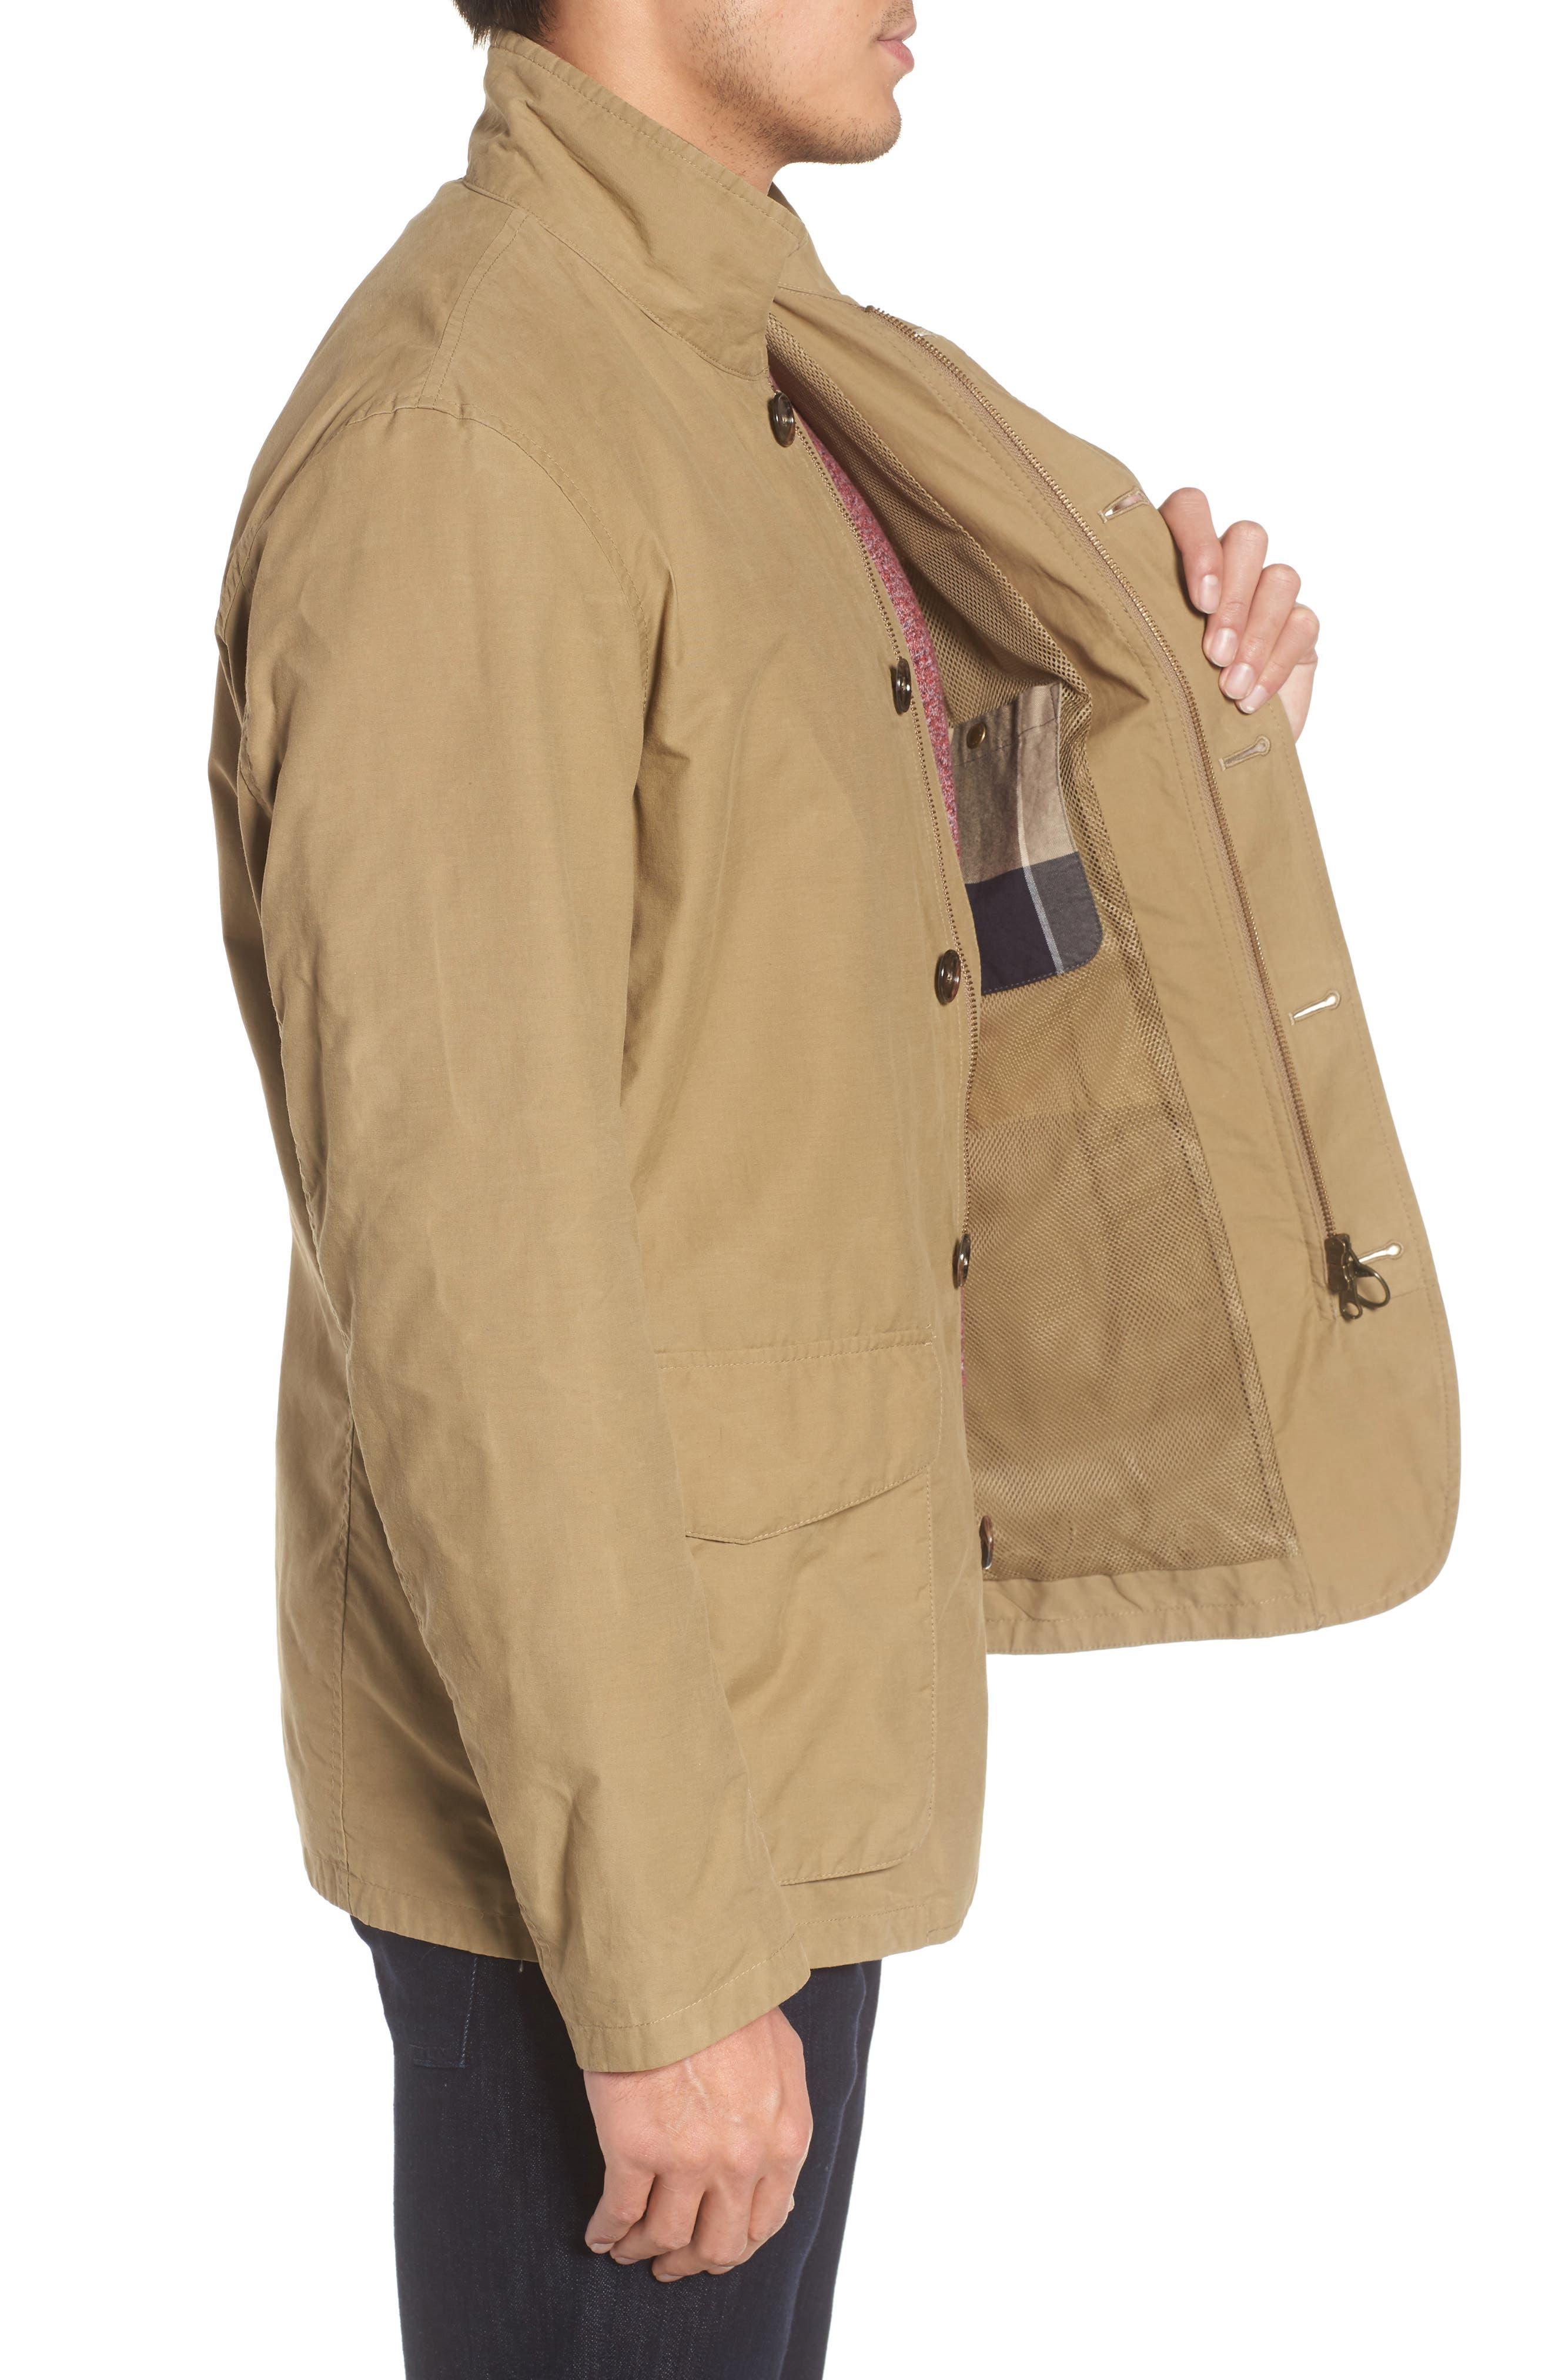 Stump Jacket,                             Alternate thumbnail 3, color,                             270